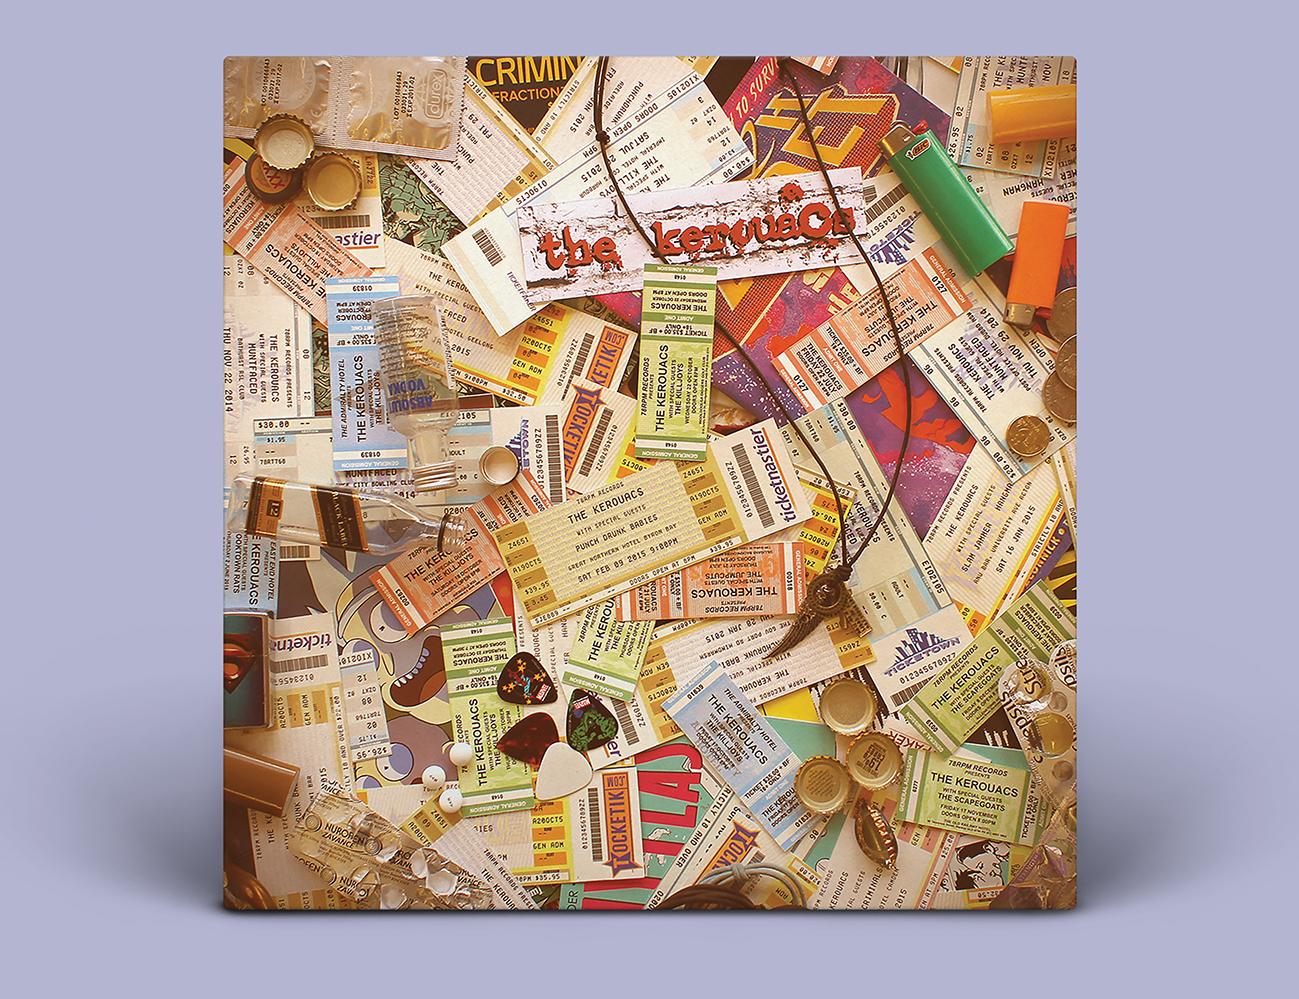 The Kerouacs album cover front